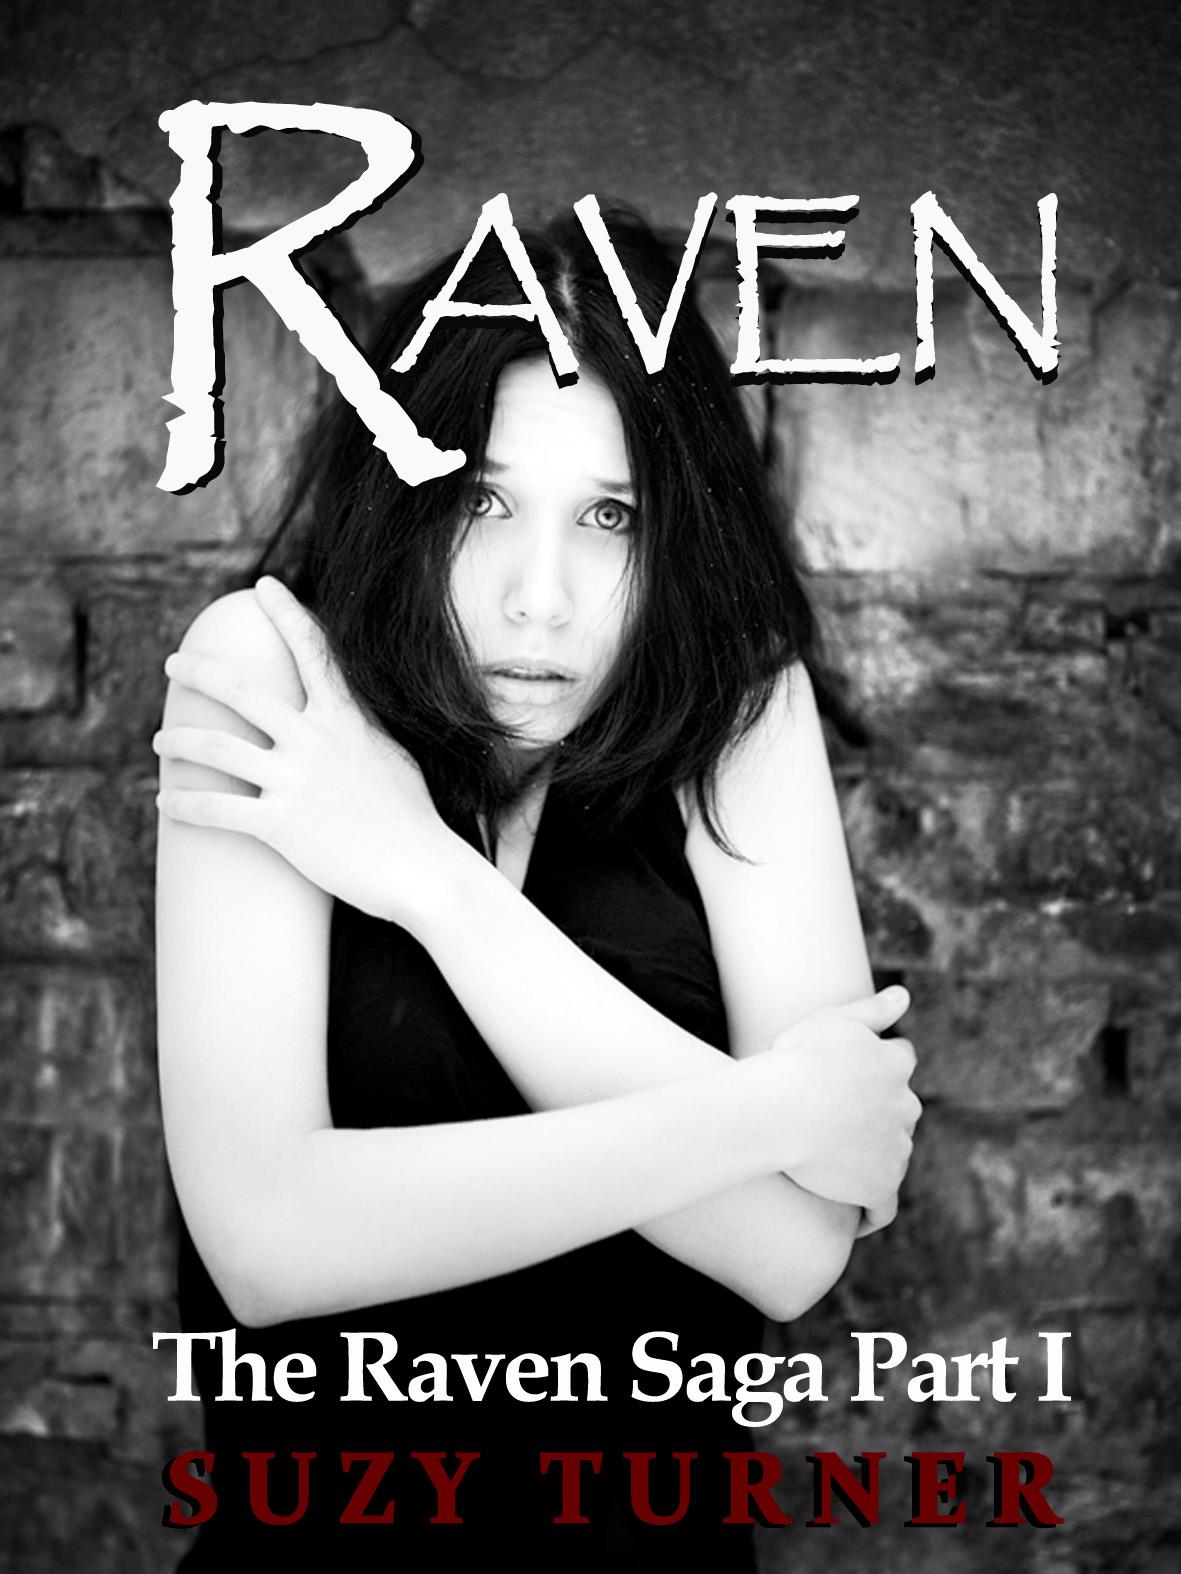 Raven: The Raven Saga Part I